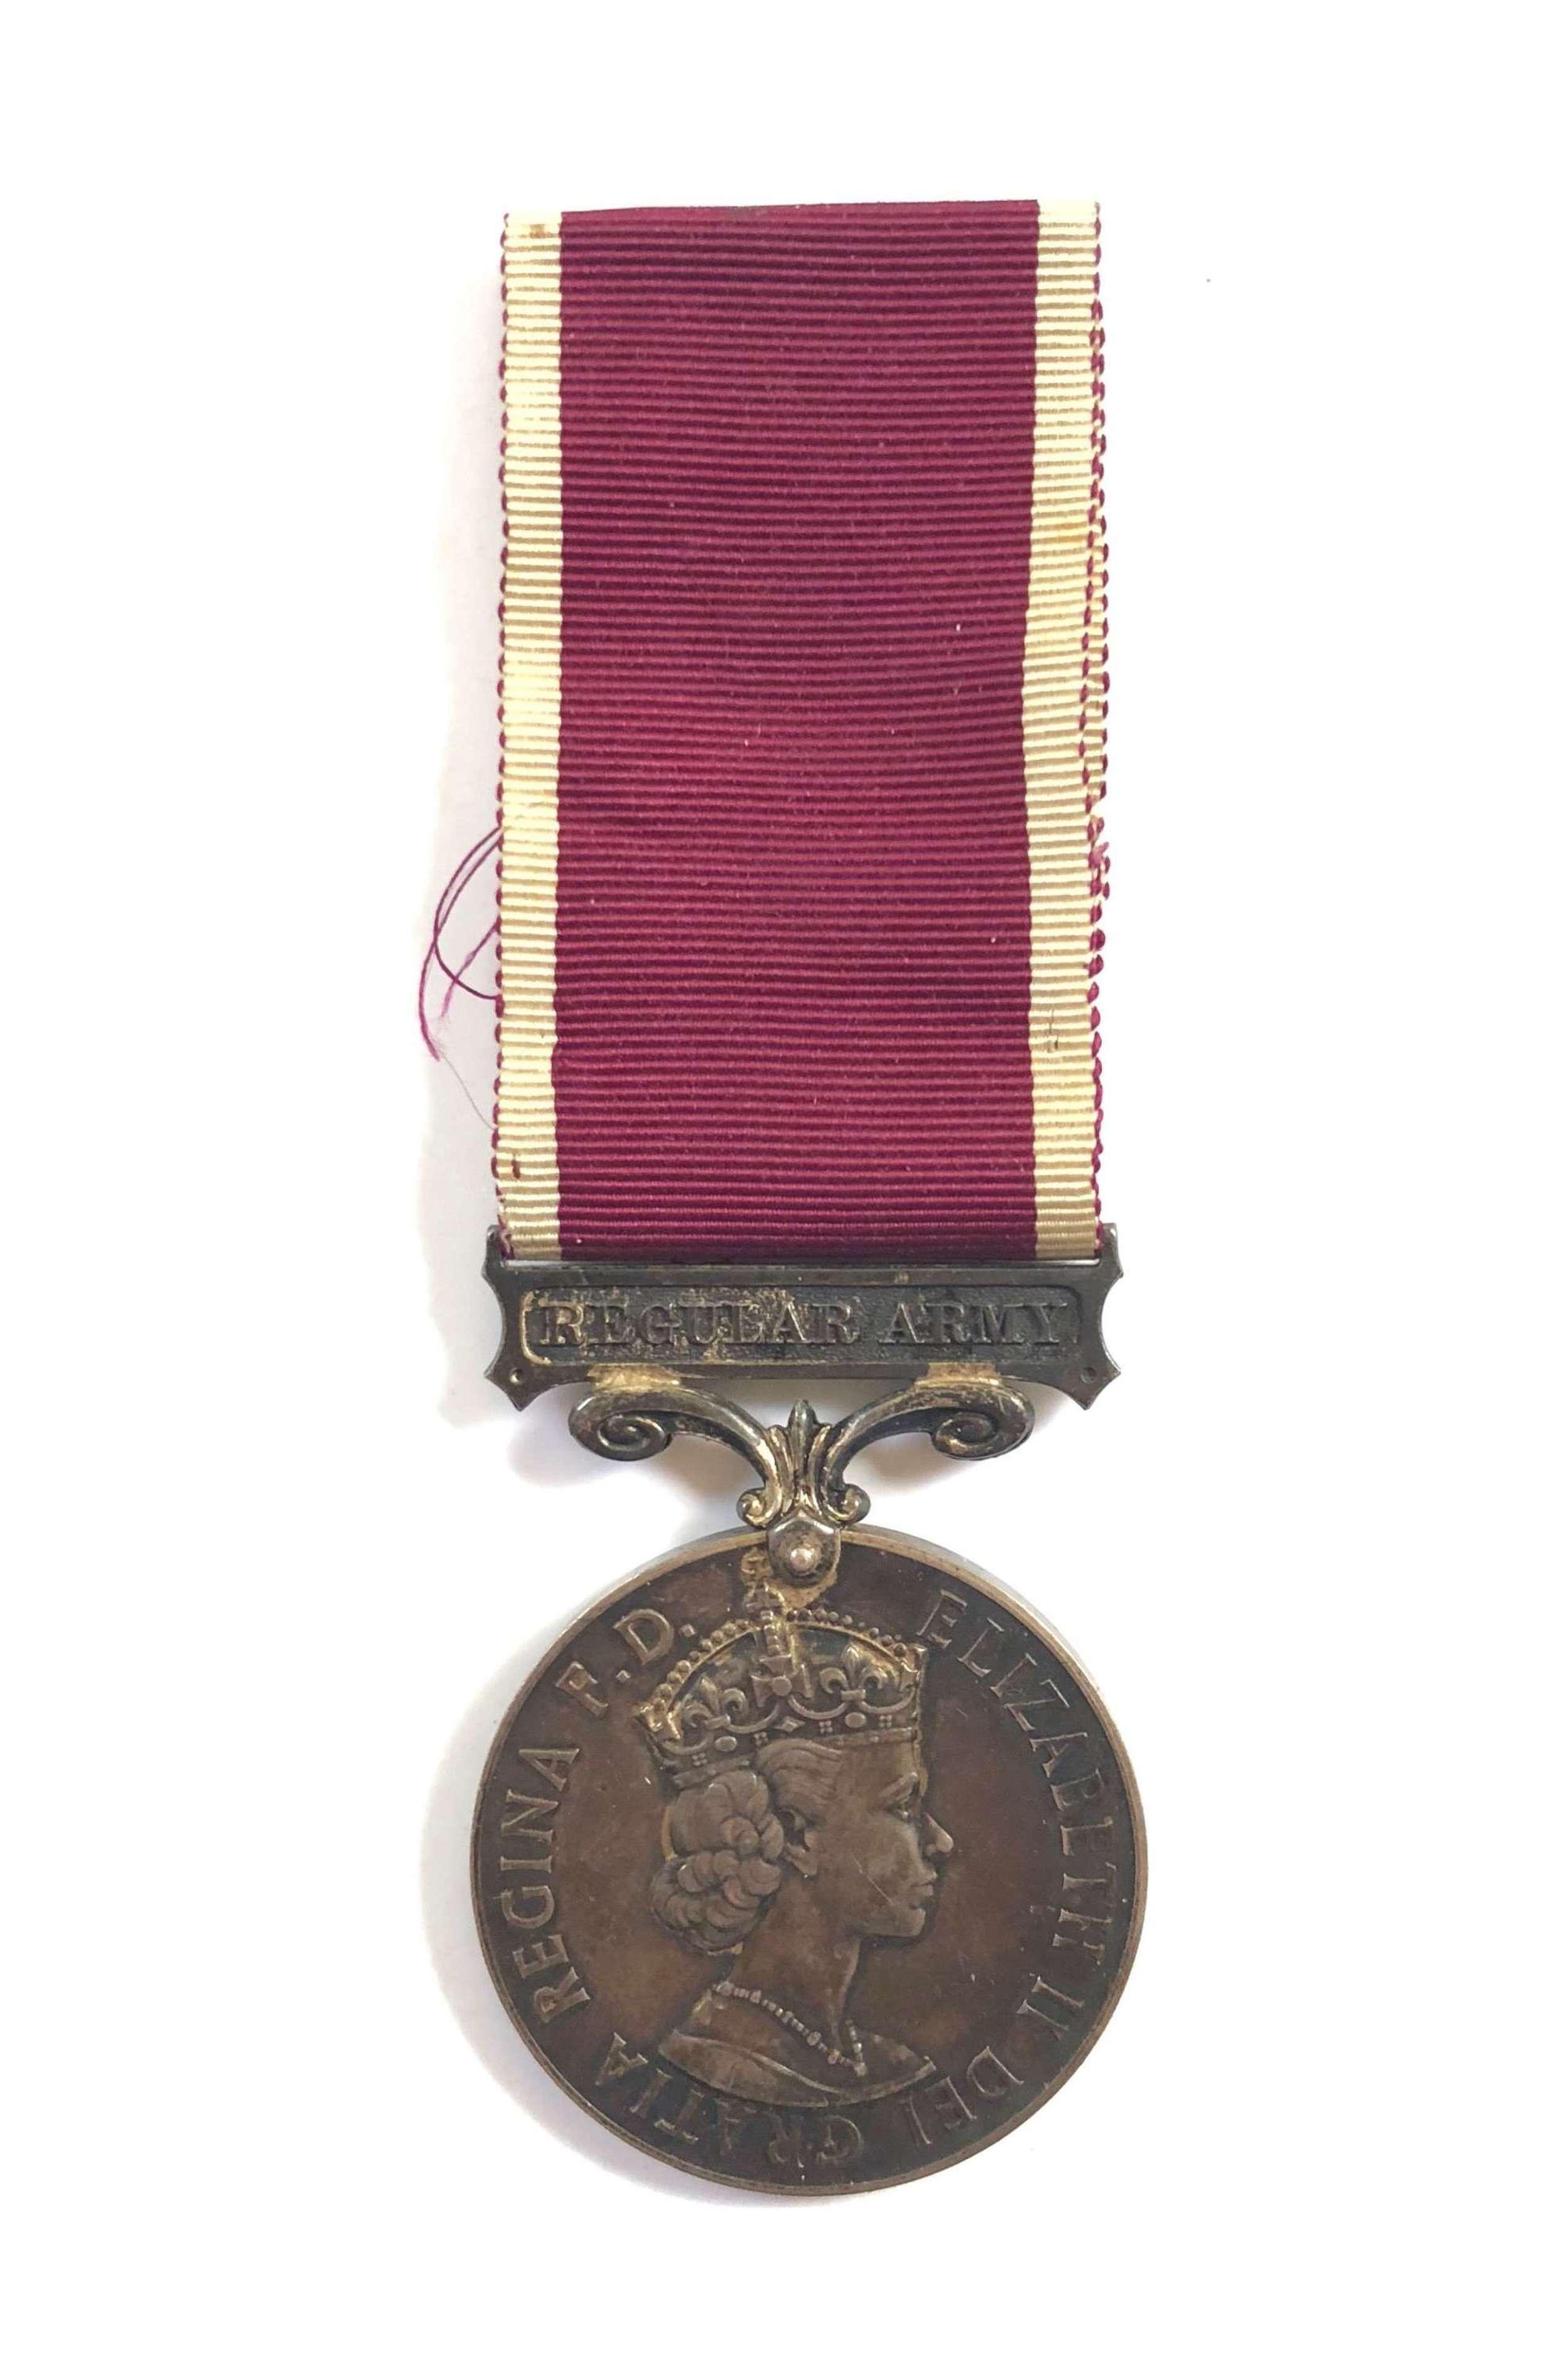 Royal Army Ordinance Corps Regular Army Long Service Medal.